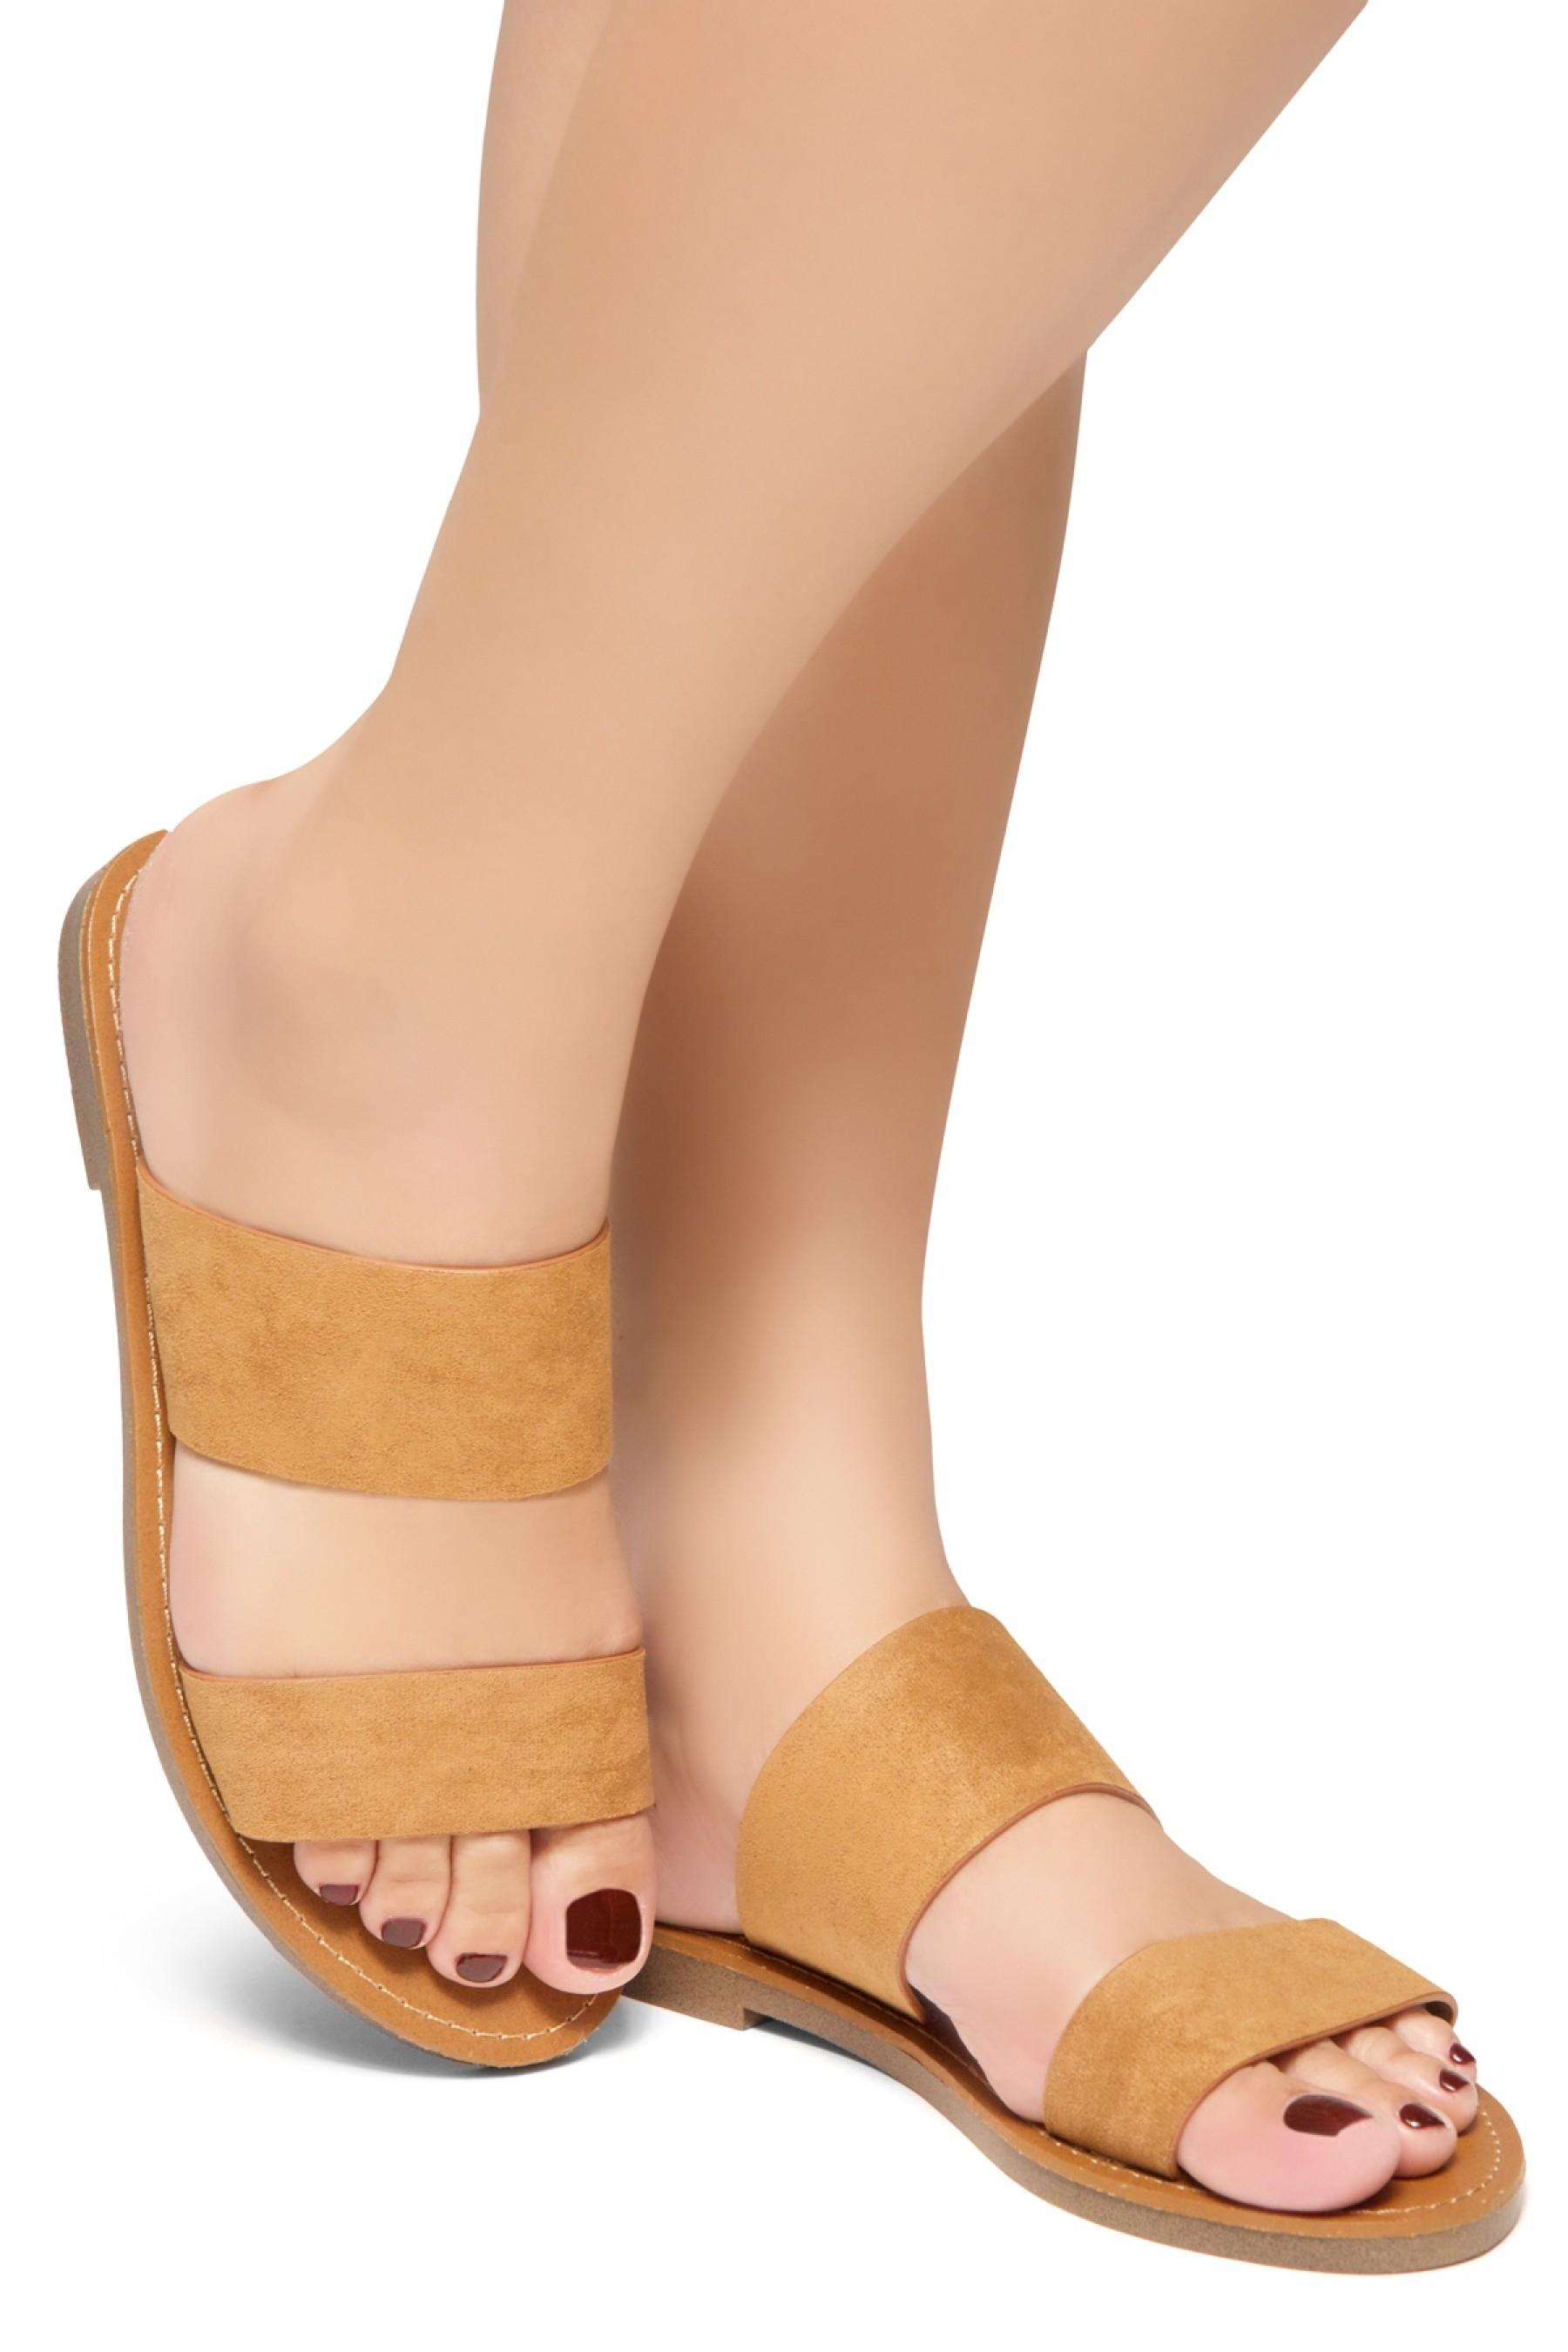 HerStyle Native- Open Toe Double Strap Vamp Open Back Easy Slide Sandals (Cognac)